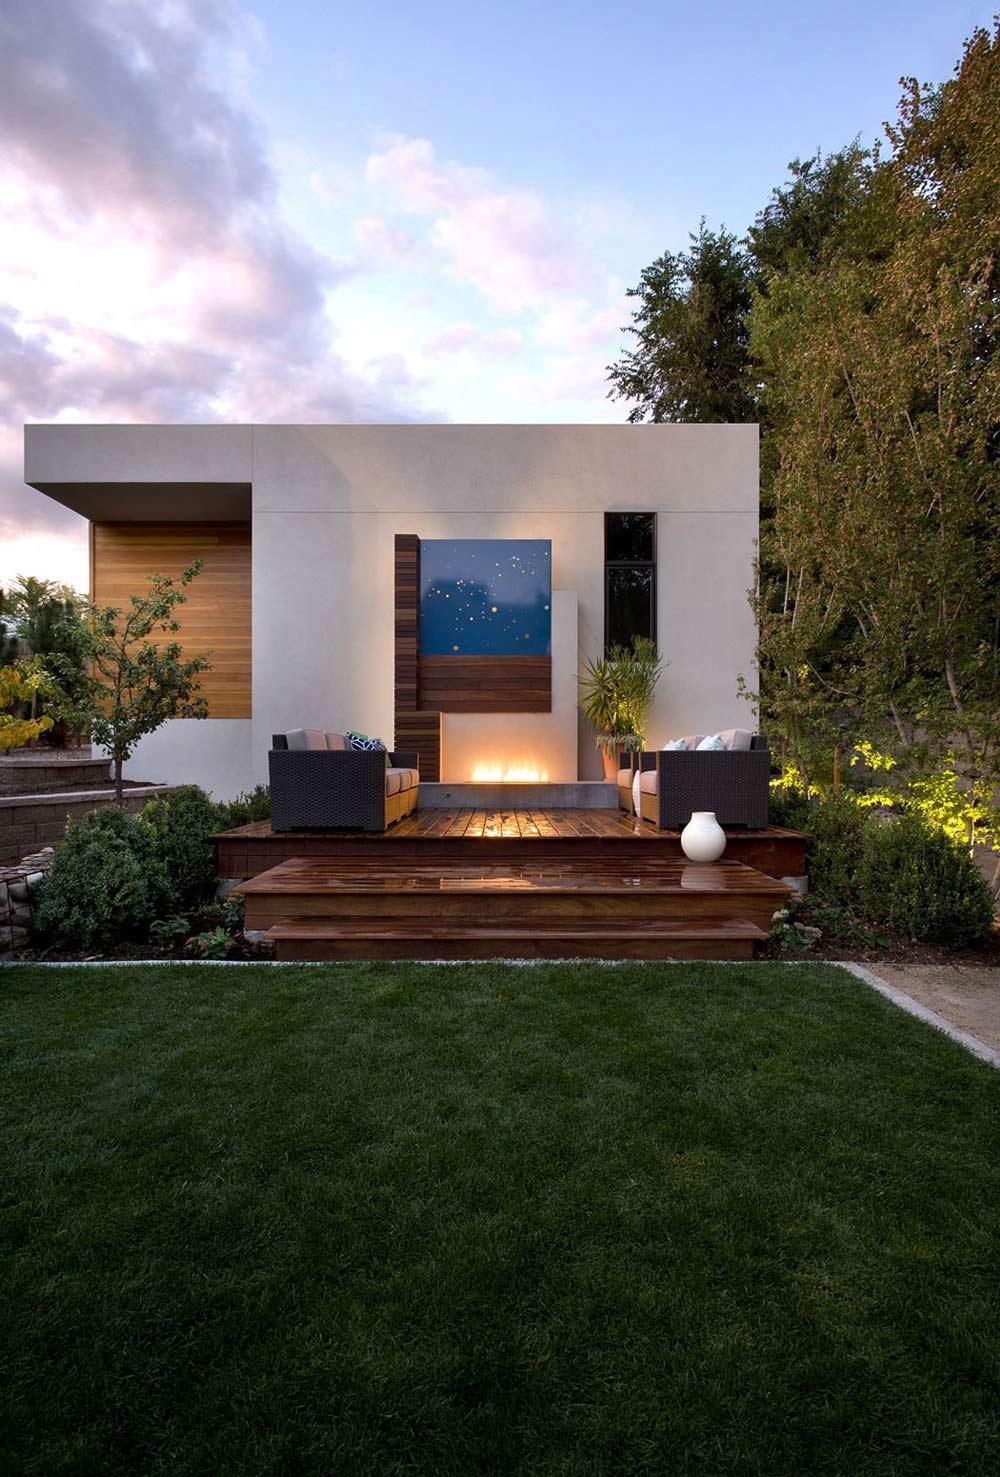 Terrace, Shield House, Colorado by Studio H:T